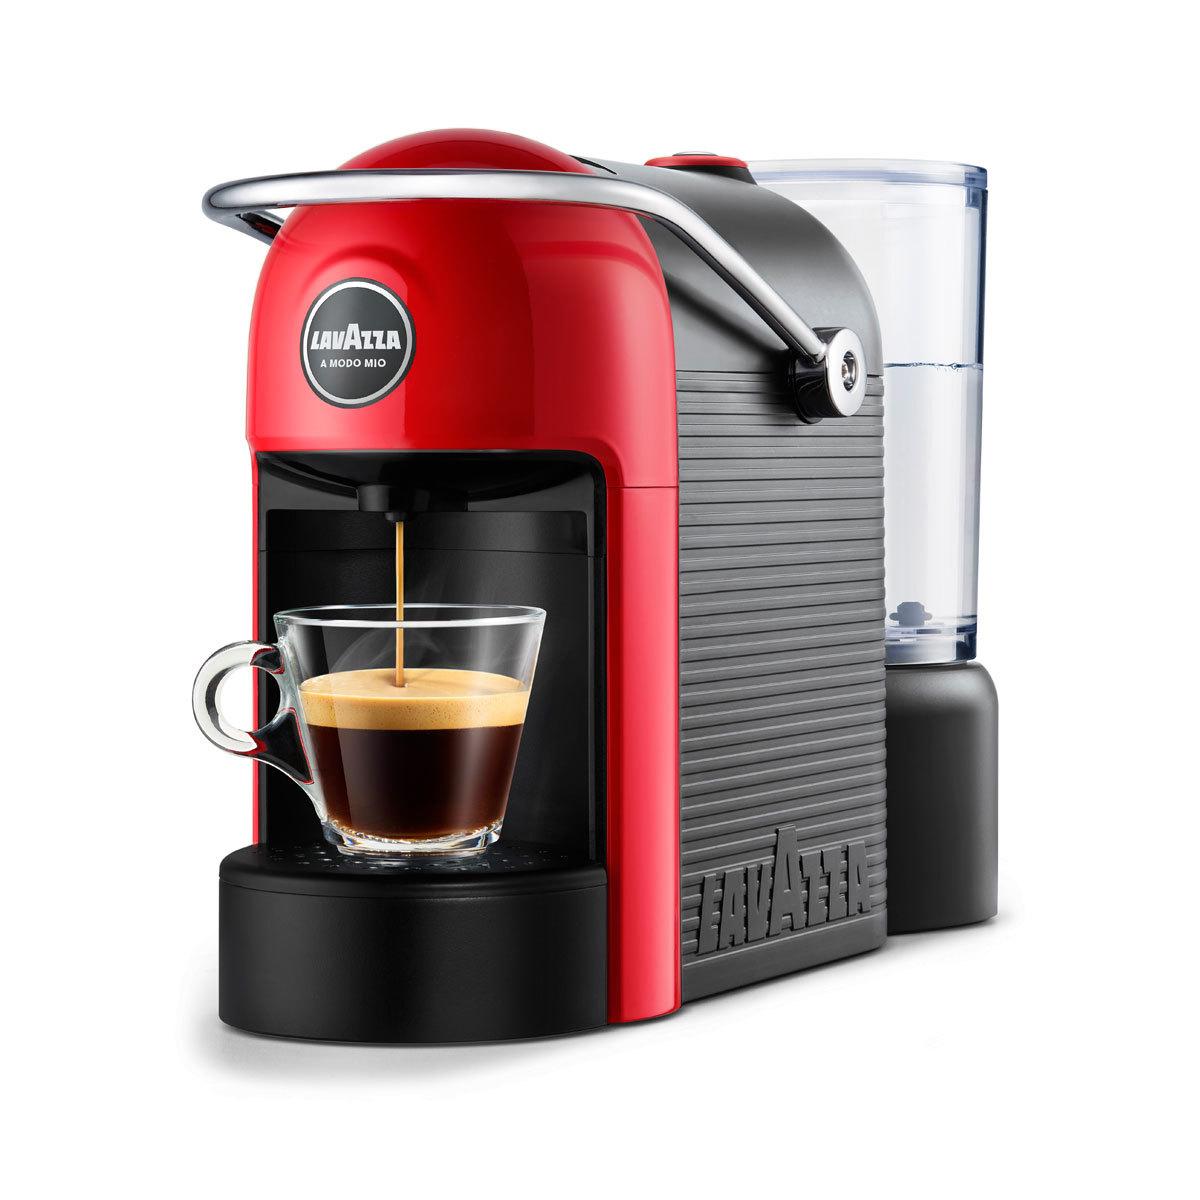 Nespresso Krups Manual Xn 250 | Bruin Blog